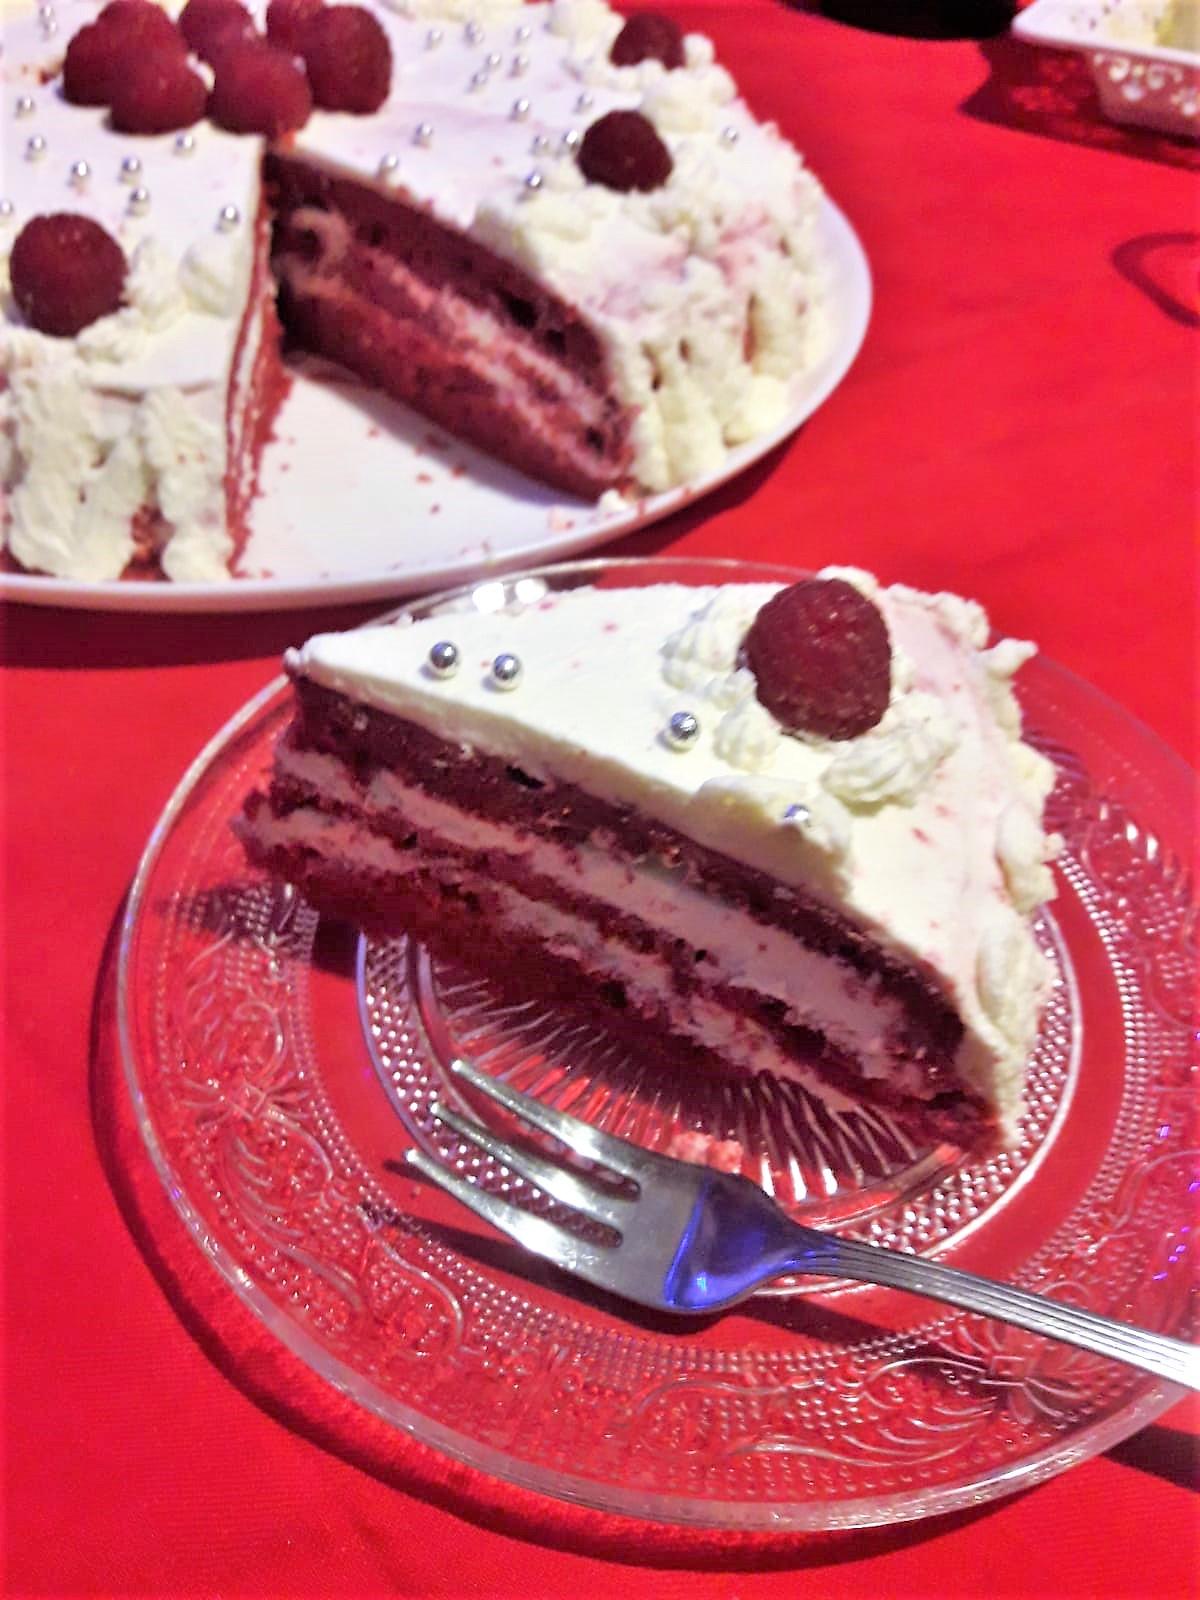 Tronchetto Di Natale Cucchiaio D Argento.Torta Red Velvet Ricetta Originale Kitchen Clue